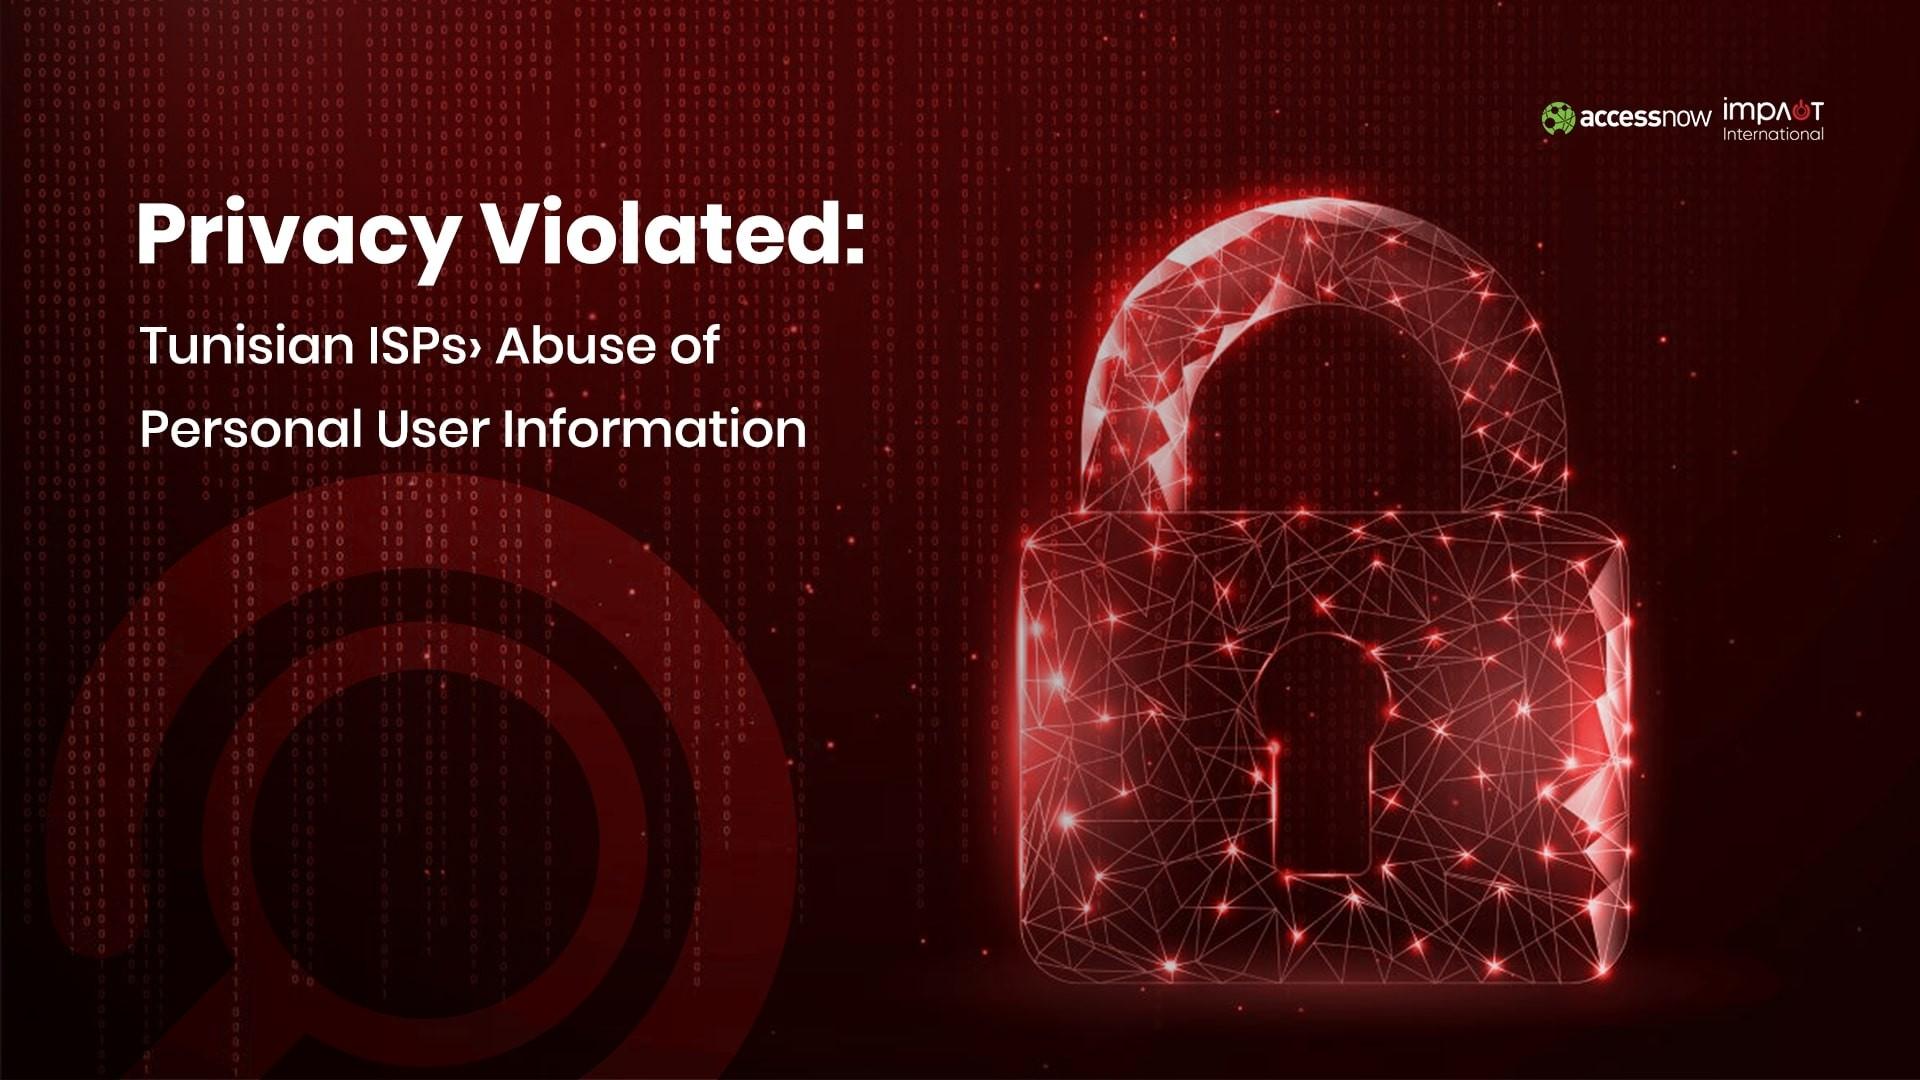 New Study: Tunisian ISPs violate customers' privacy